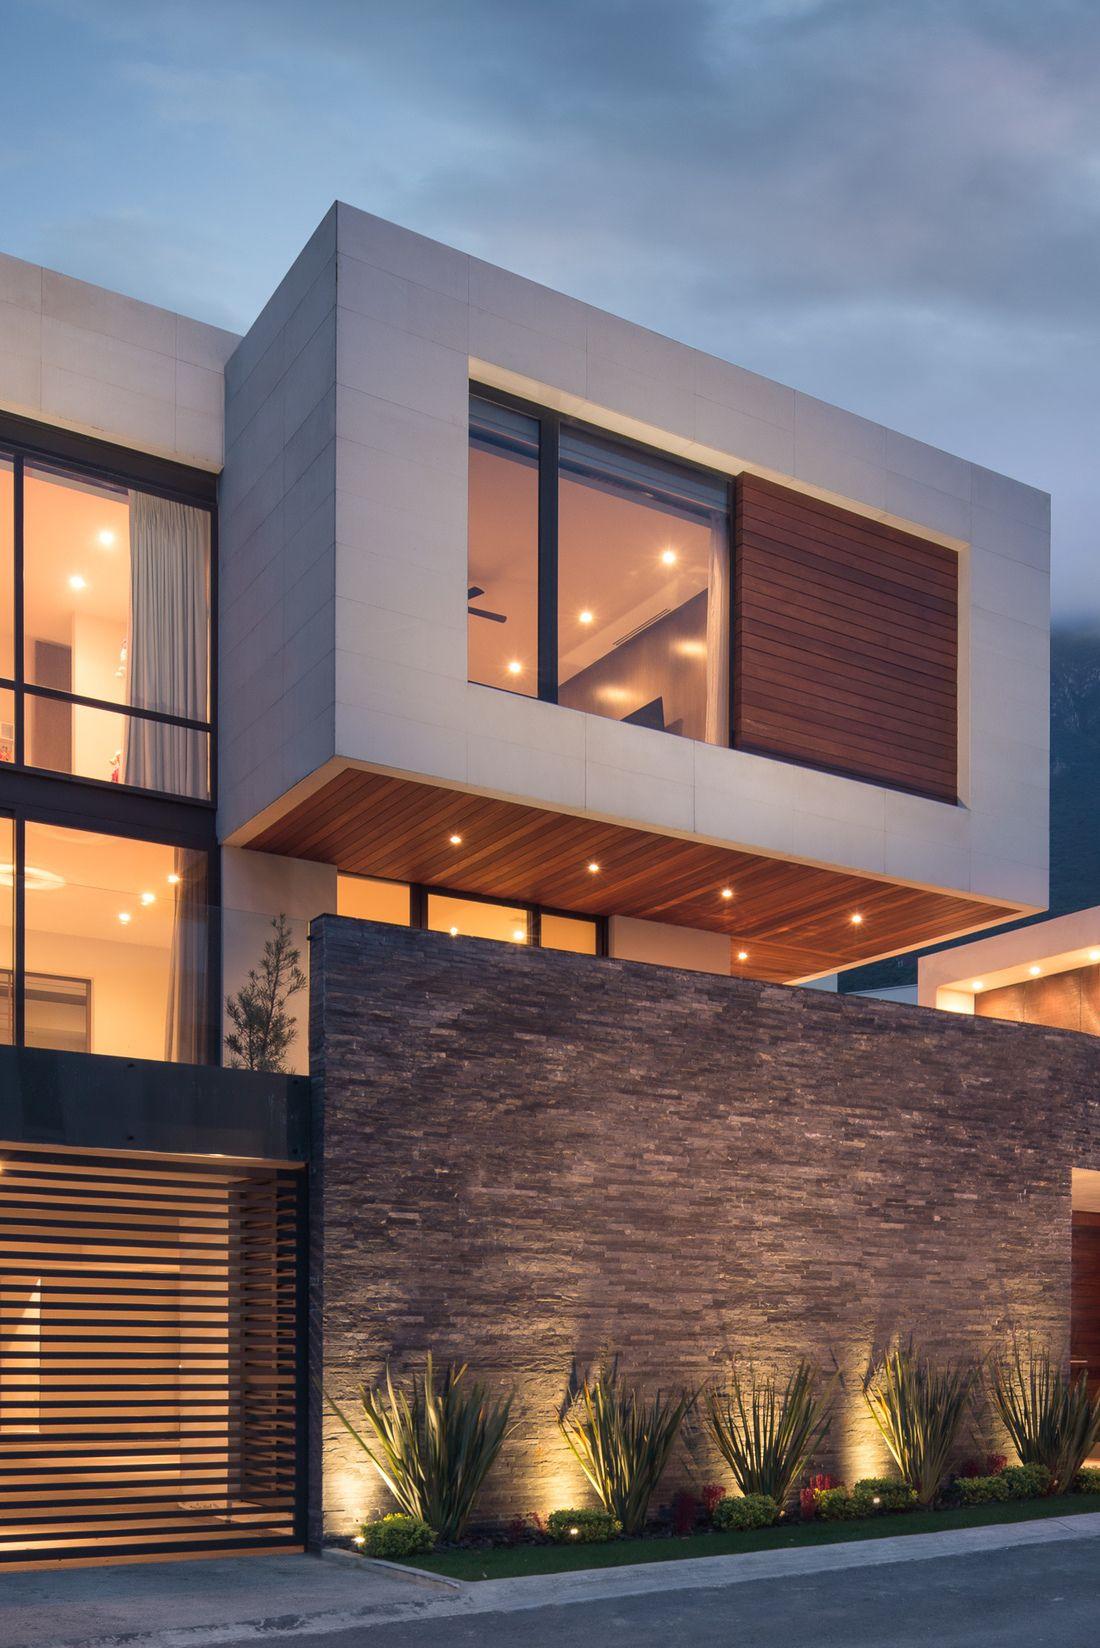 fachada casa. piedra. iluminacion. | home decor in 2018 | pinterest